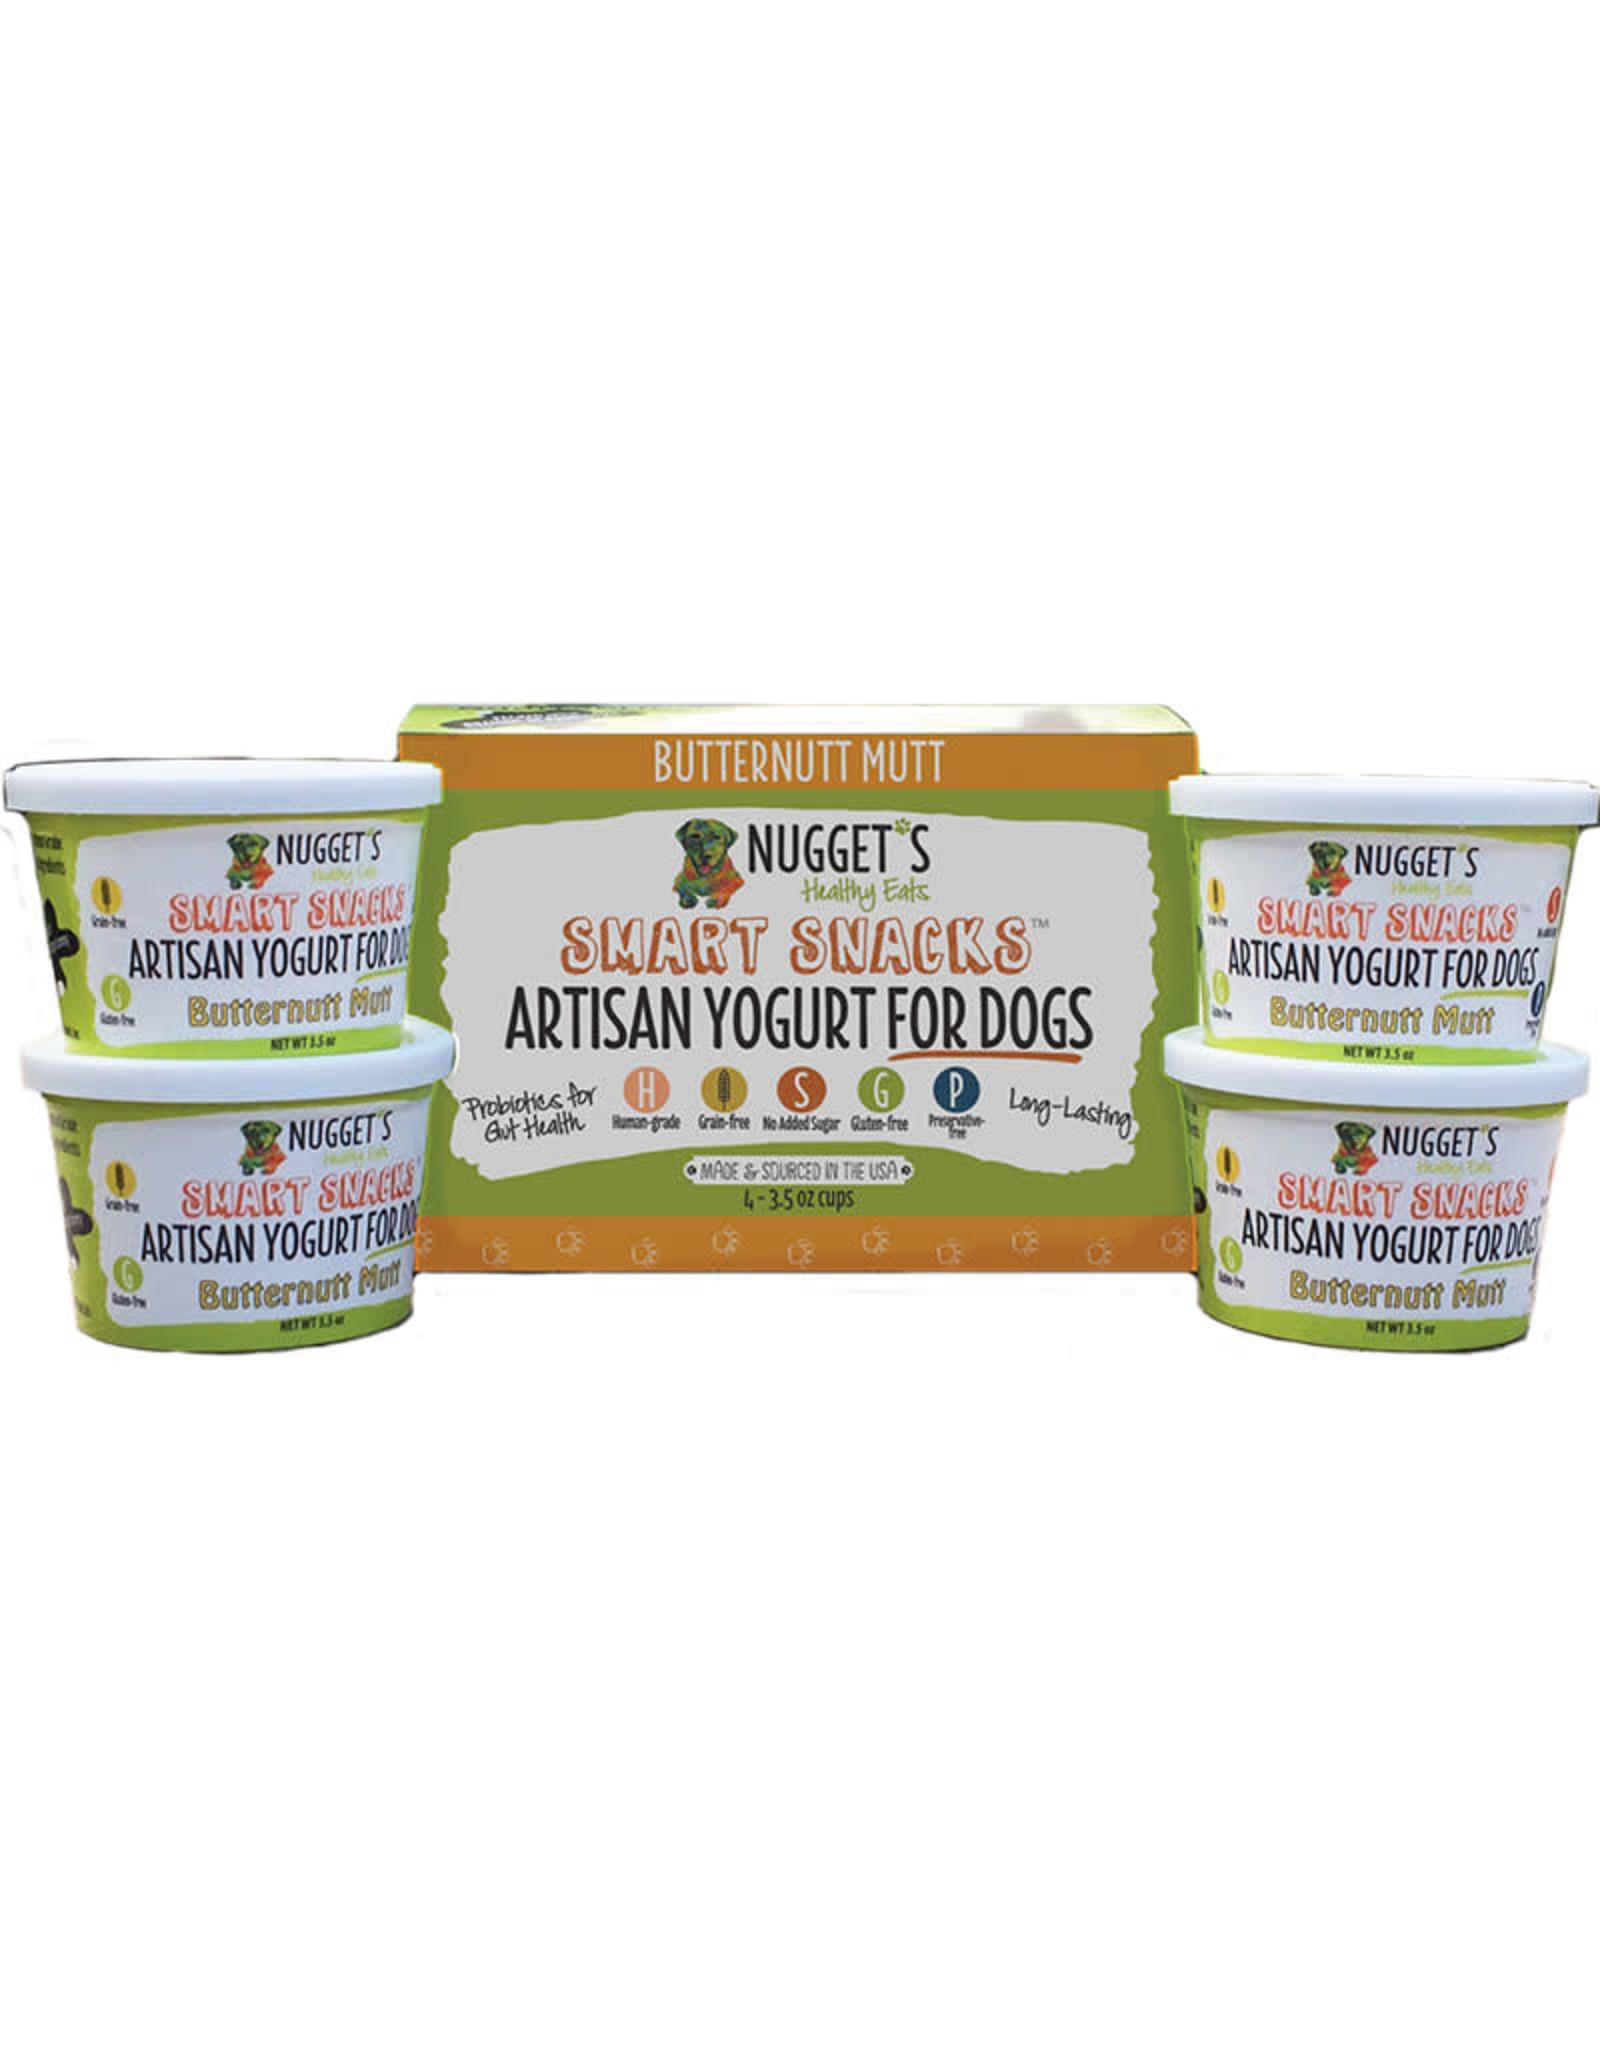 Nuggets Healthy Eats Nuggets Healthy Eats Artisan Yogurt for Dogs Butternut Mutt 3.5oz